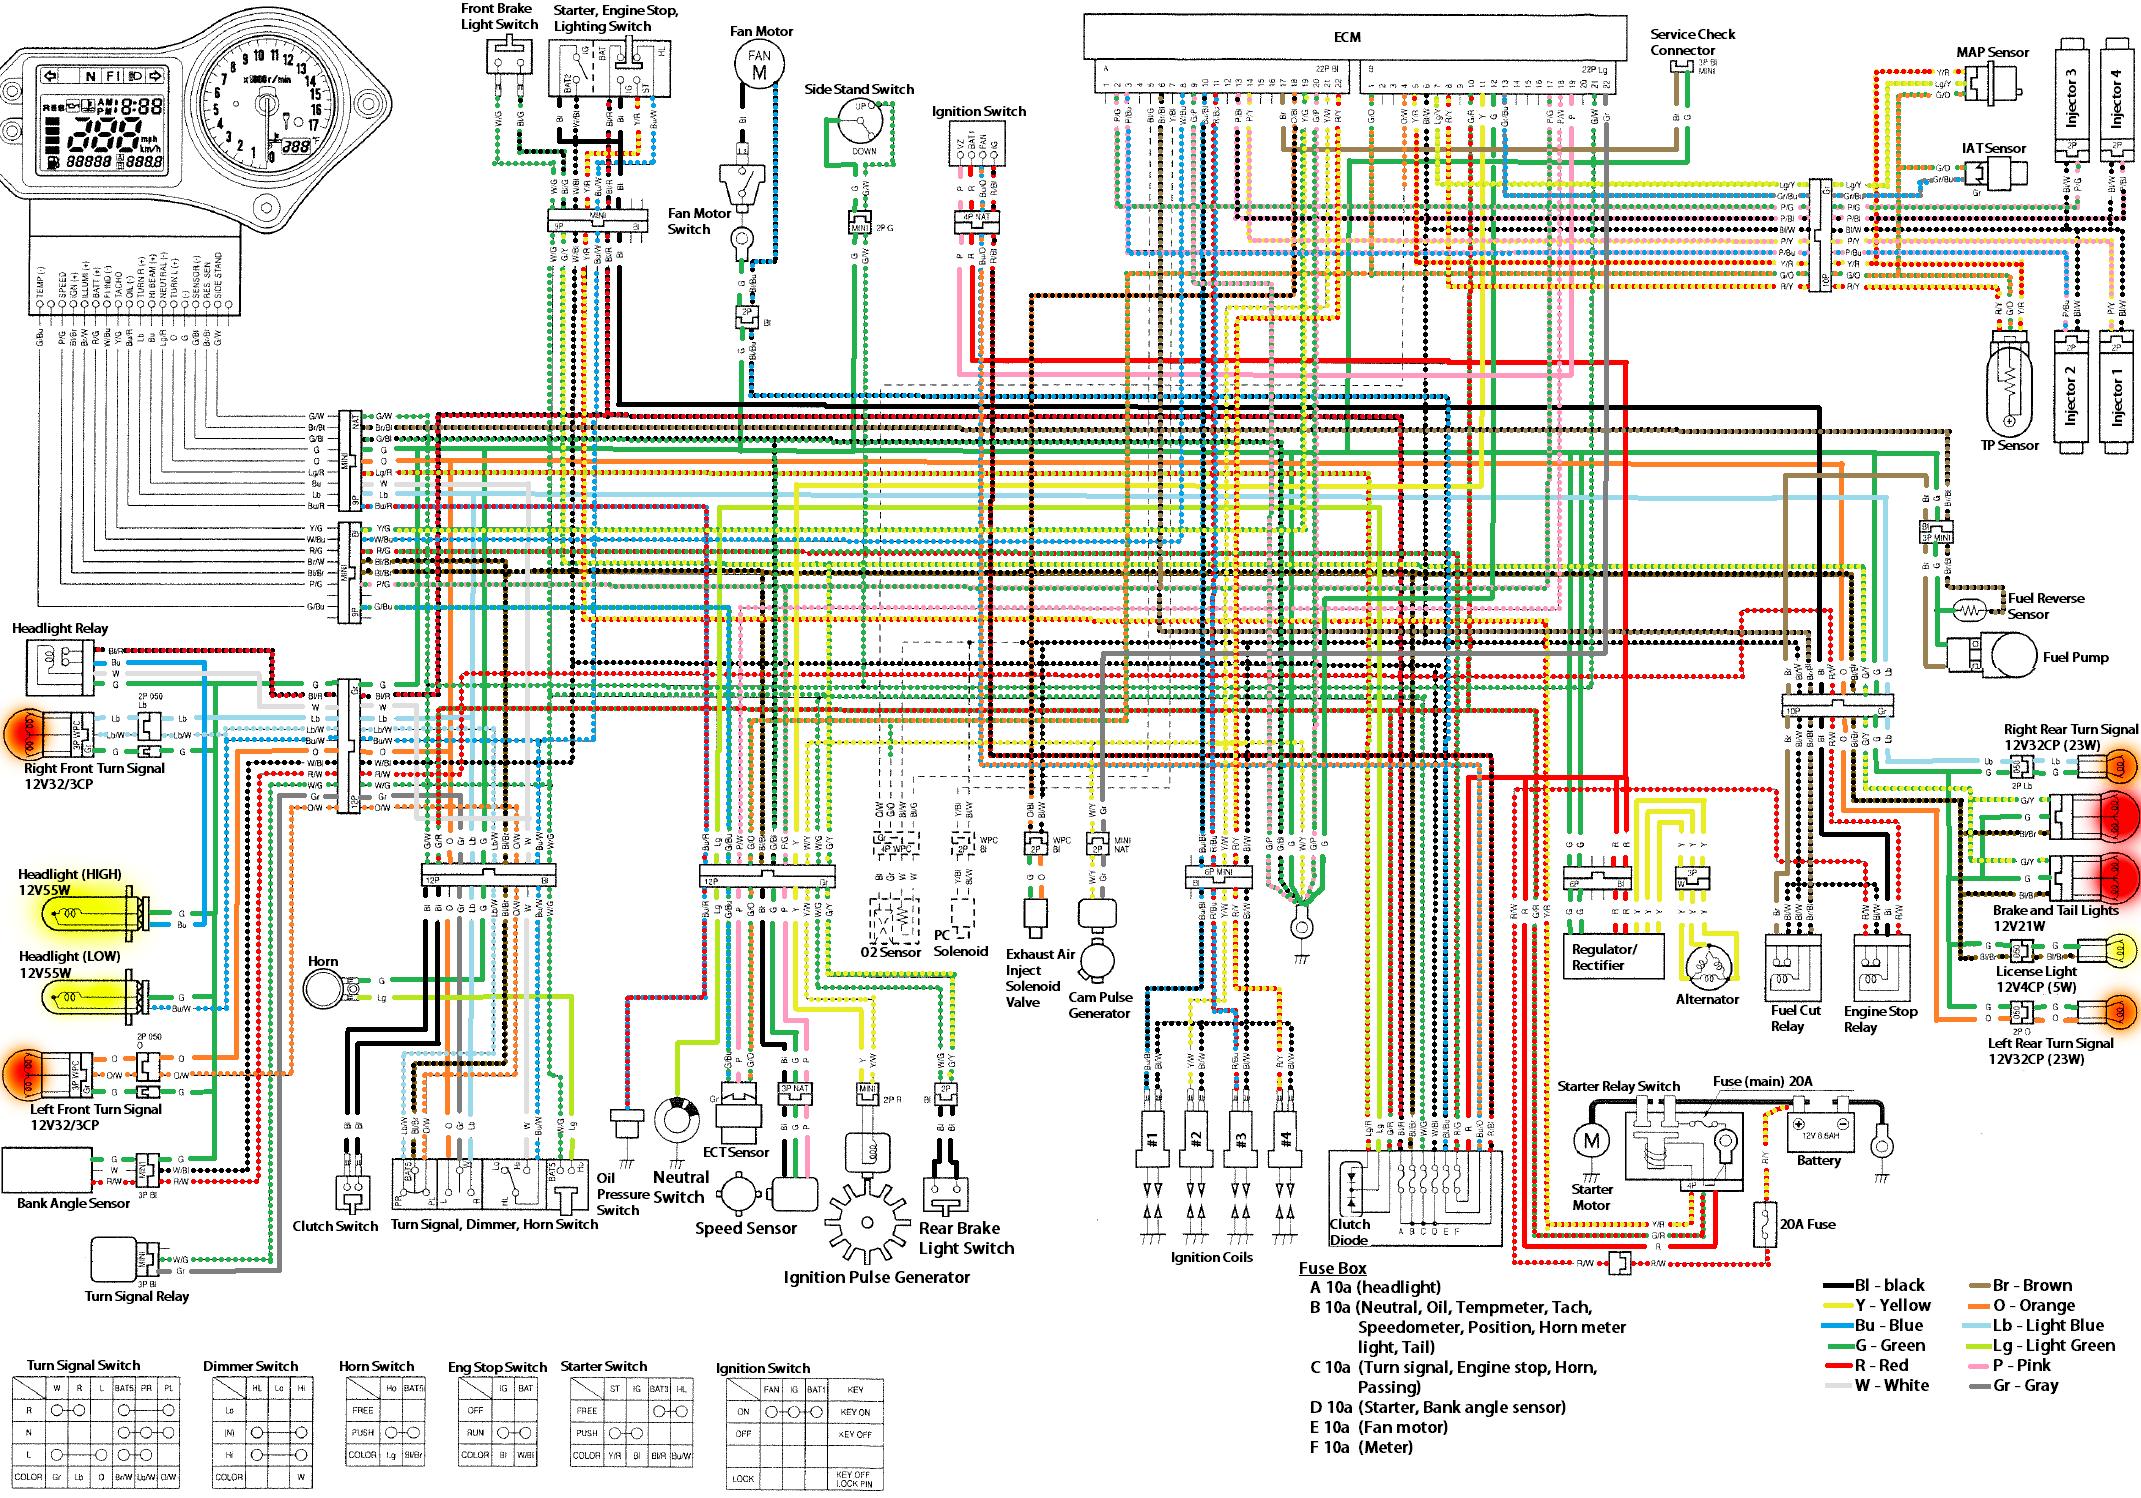 07 Cbr1000rr Wiring Diagram